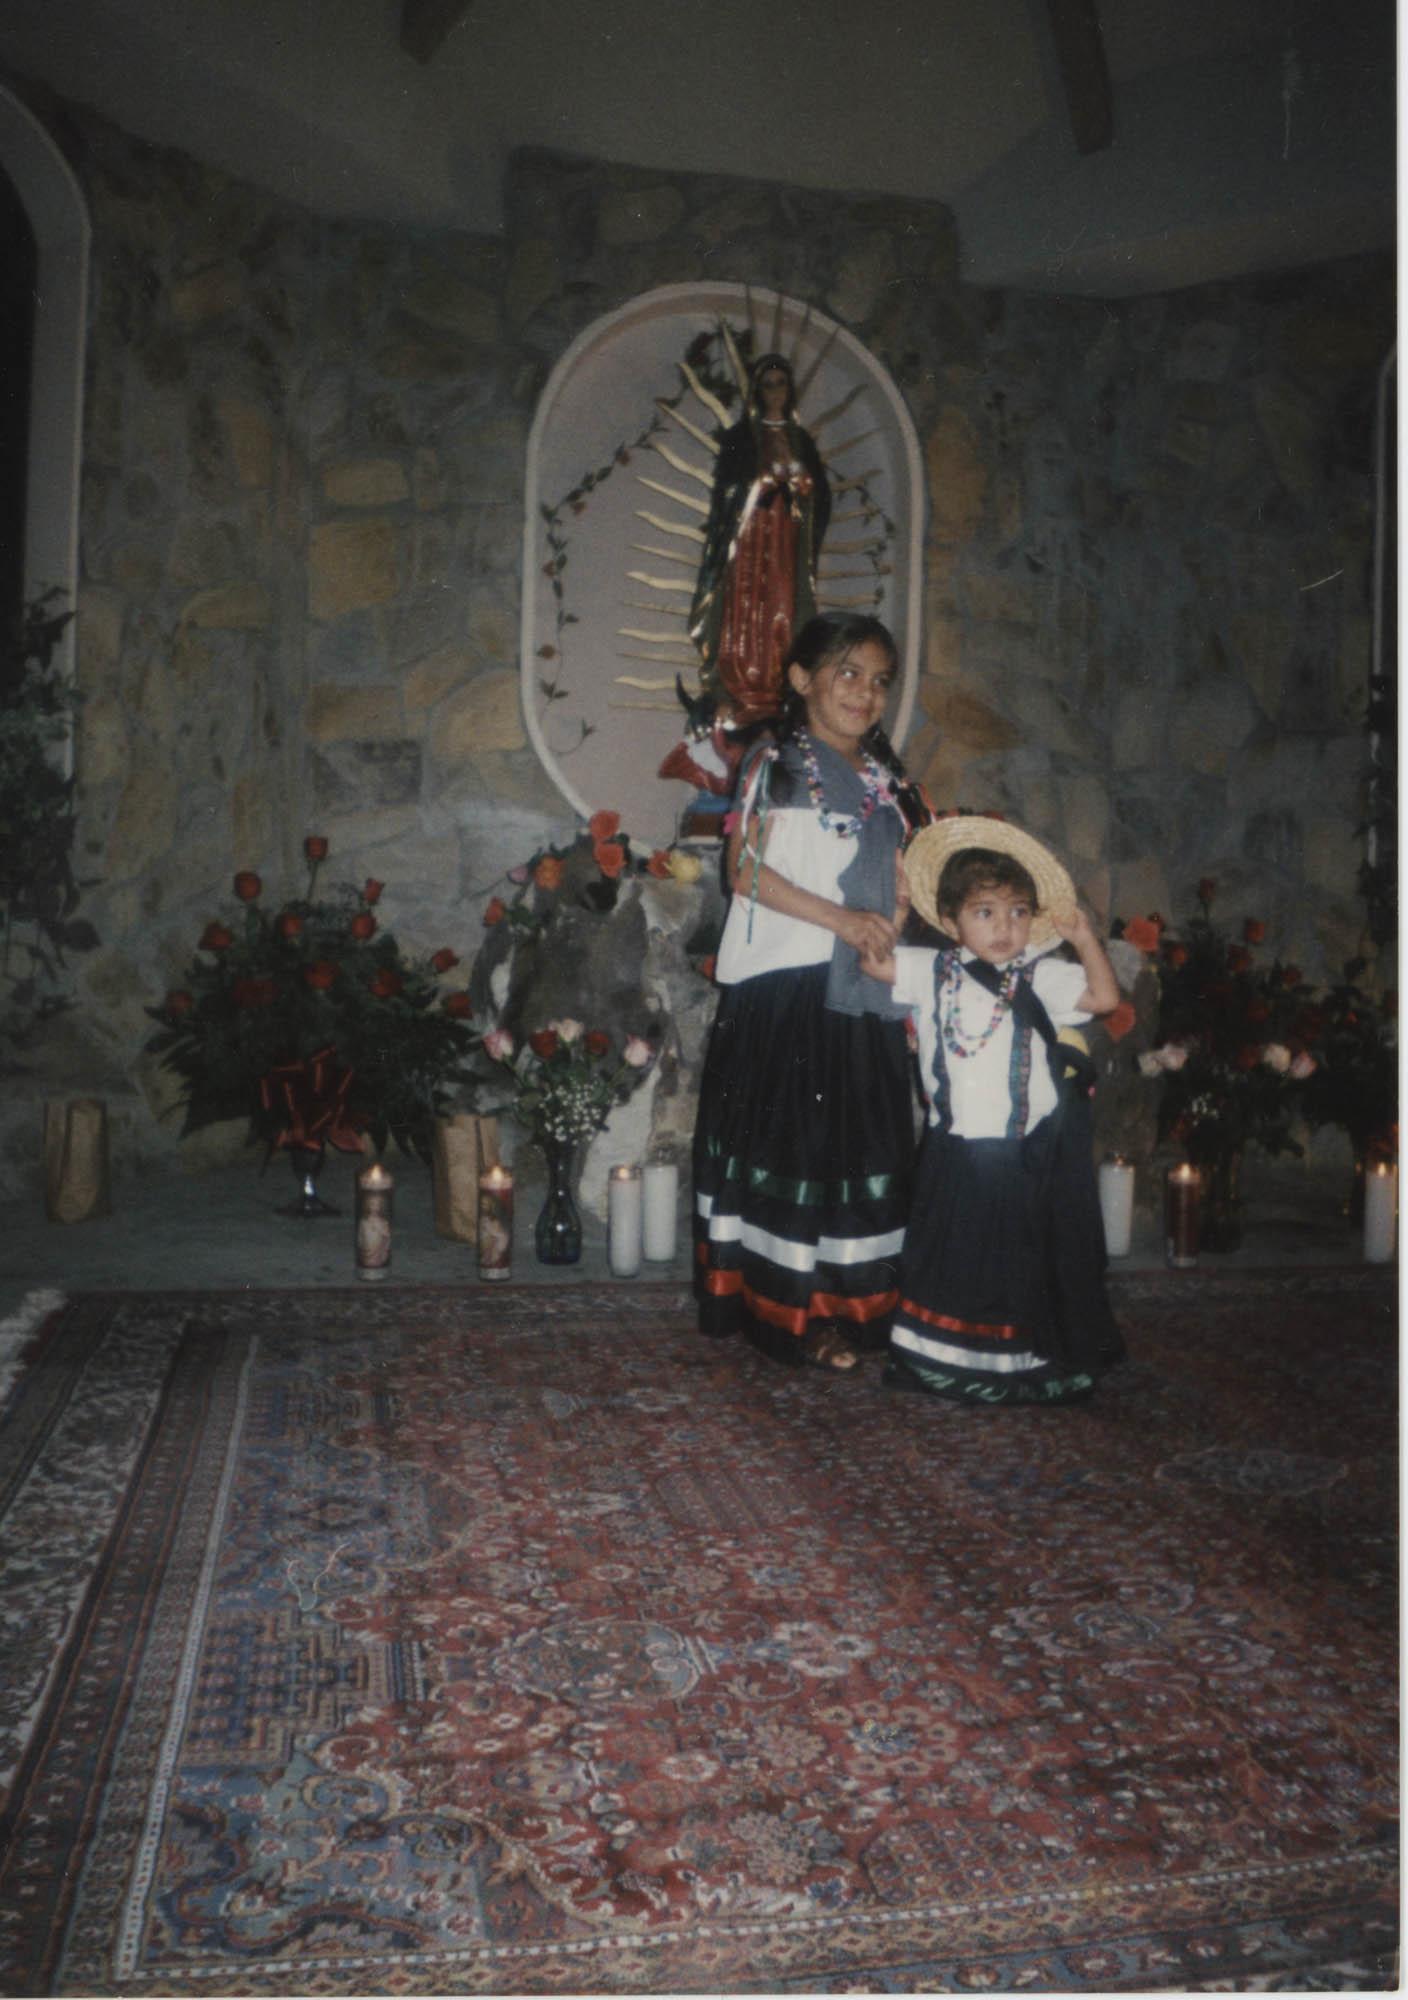 Fotografía de dos niñas junto a la Virgen de Guadalupe / Photograph of Two Girls Next to Our Lady of Guadalupe